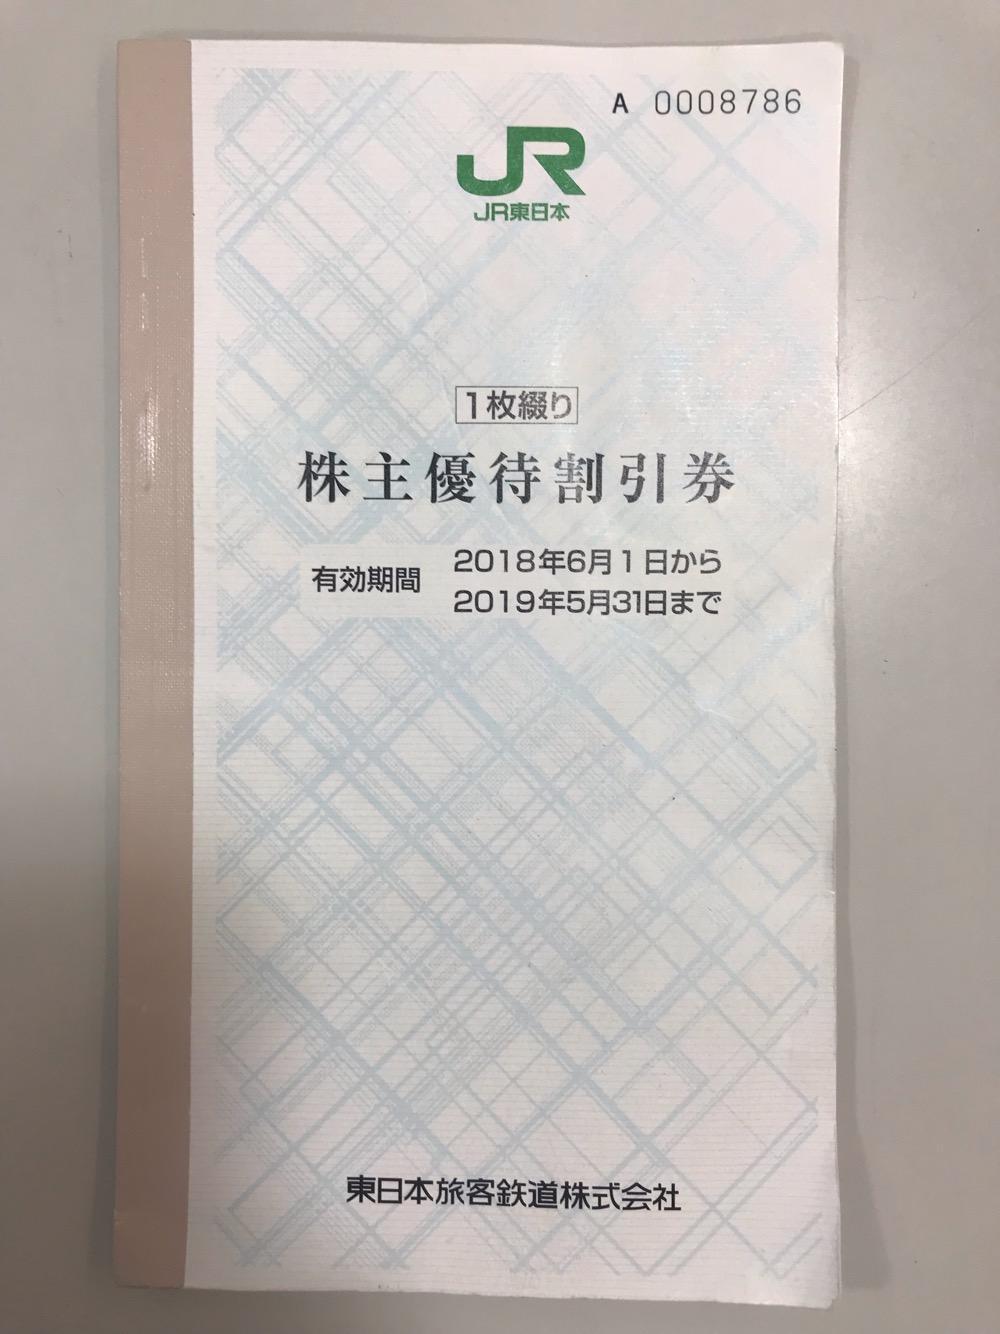 JR東日本株主優待割引券 有効期間2018年6月1日から2019年5月31日 - 表紙